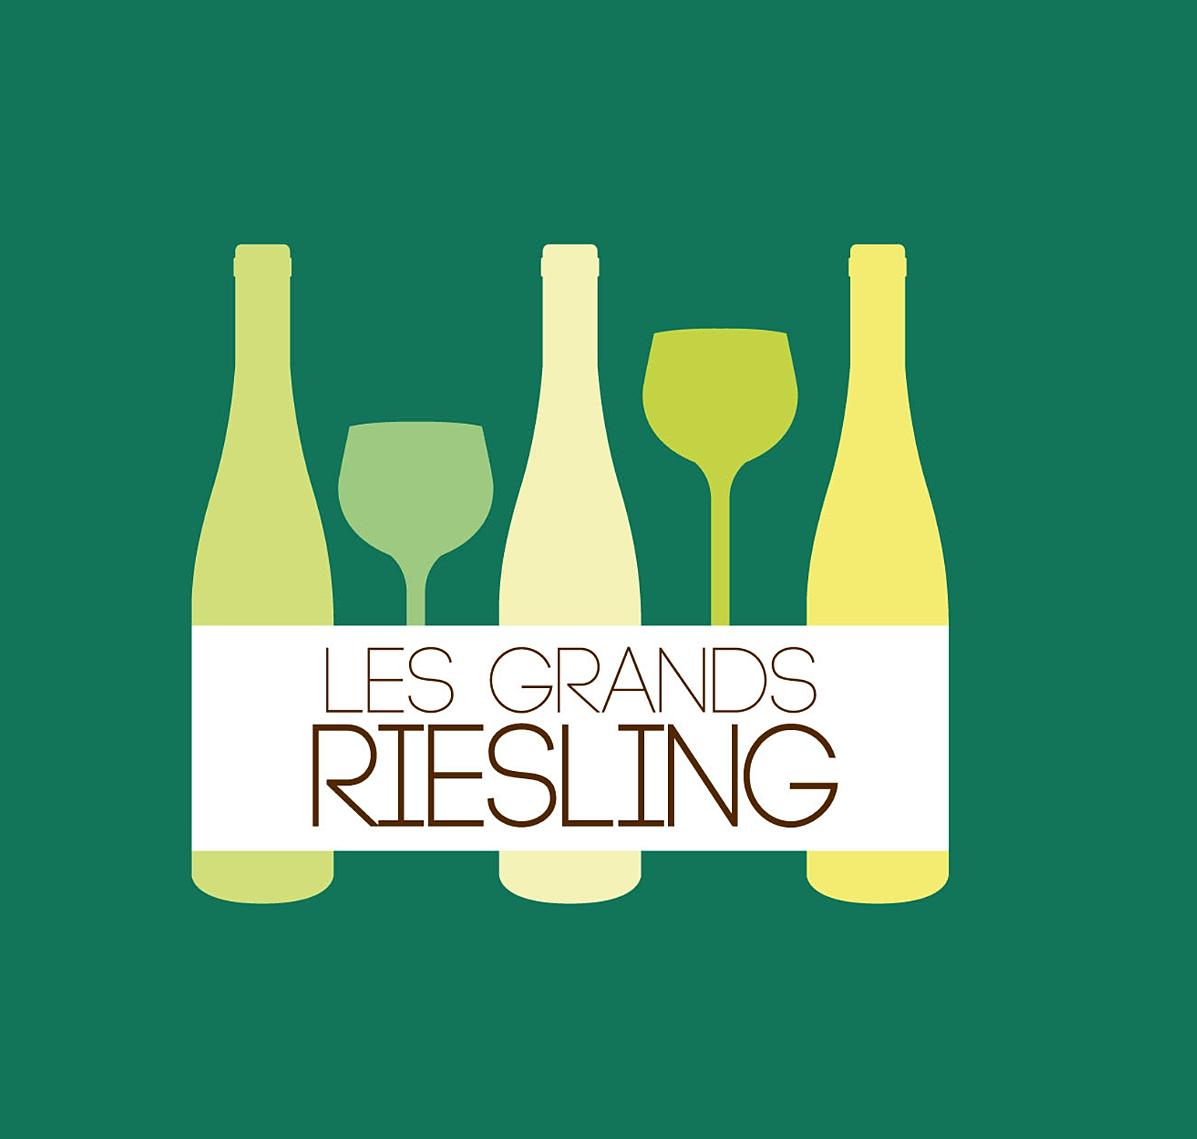 Rencontres vinicoles lyon 2017